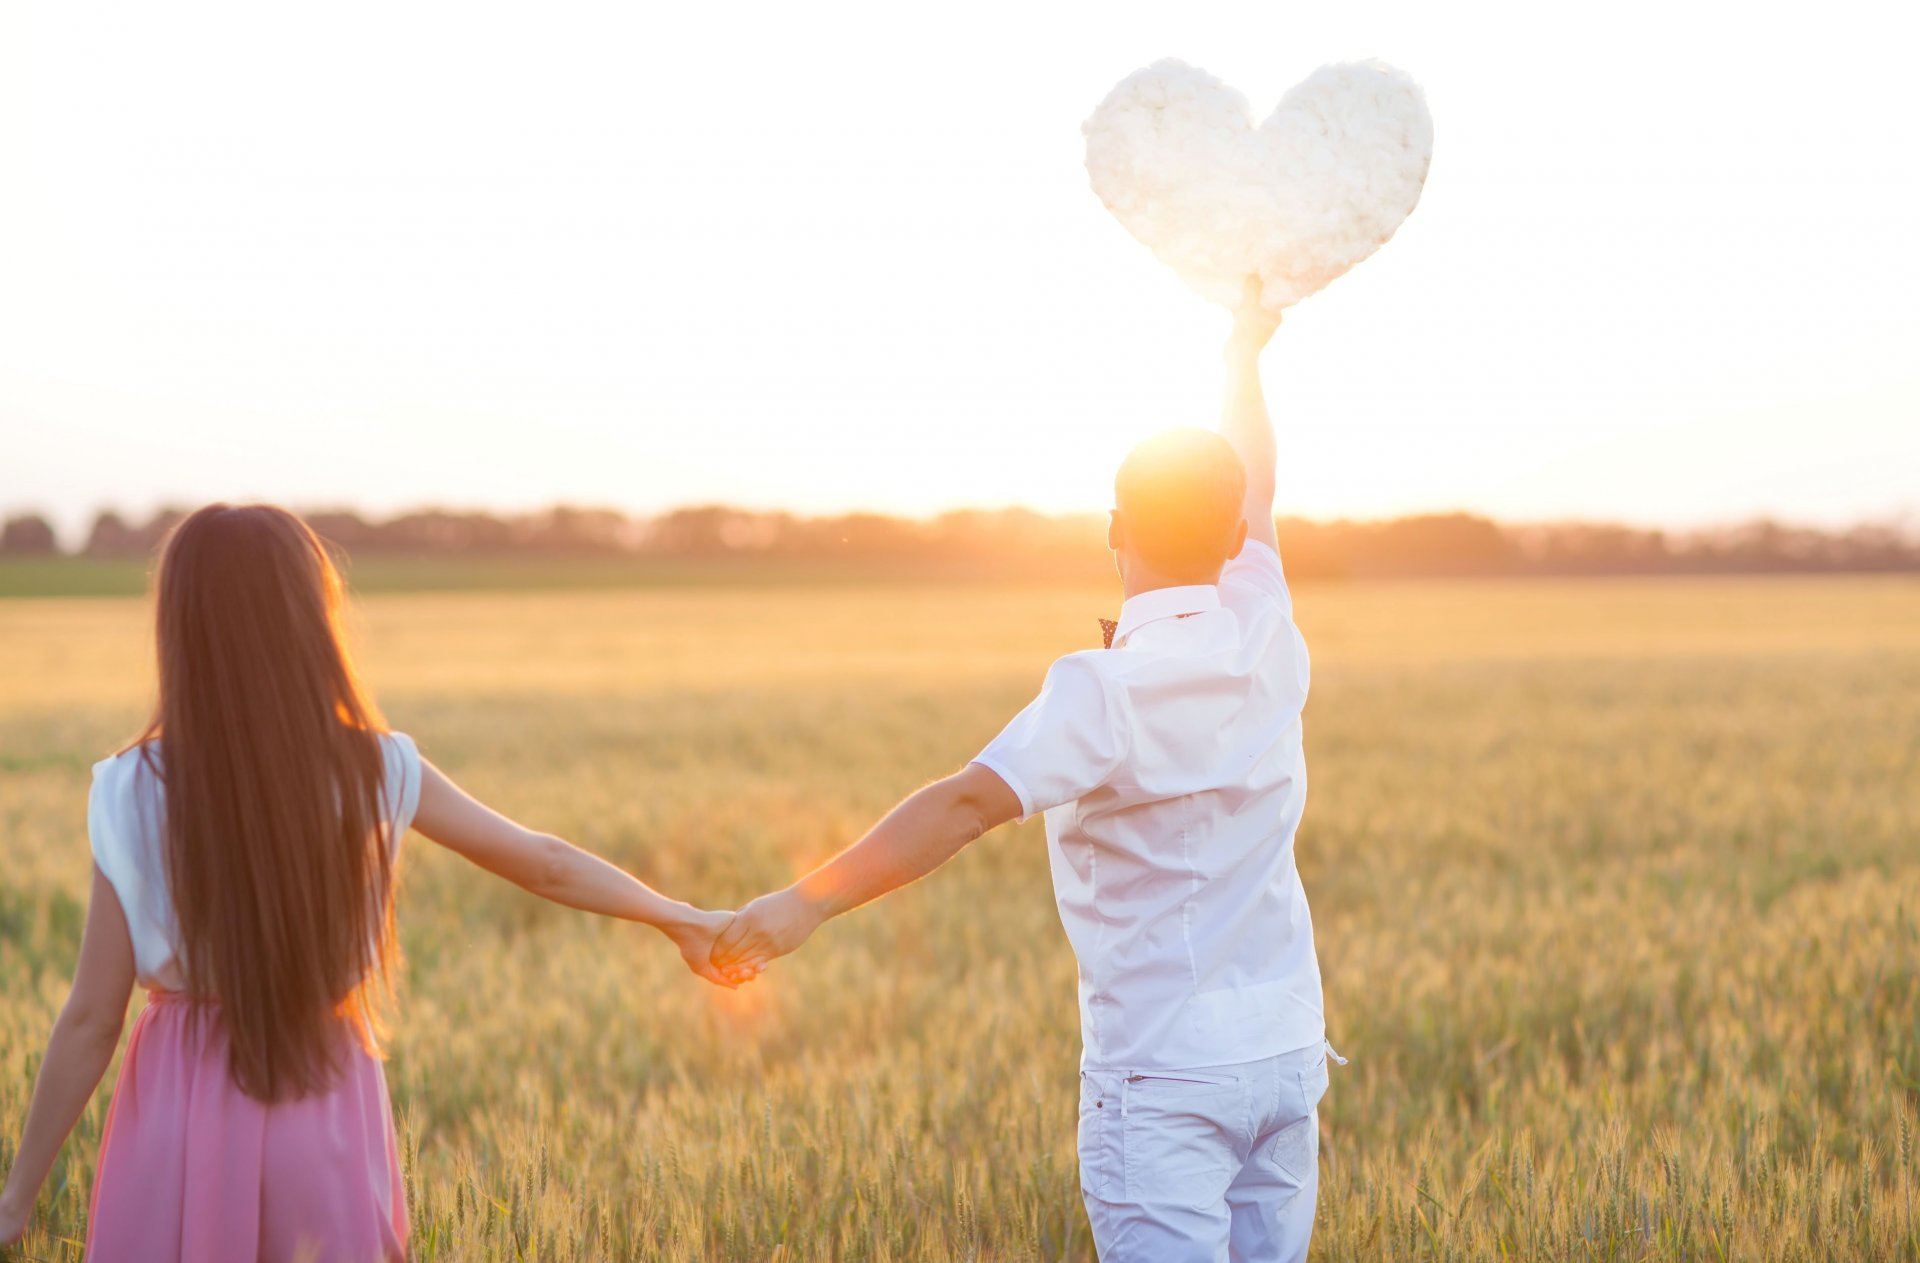 любовь жизнь пара природа love life pair nature бесплатно